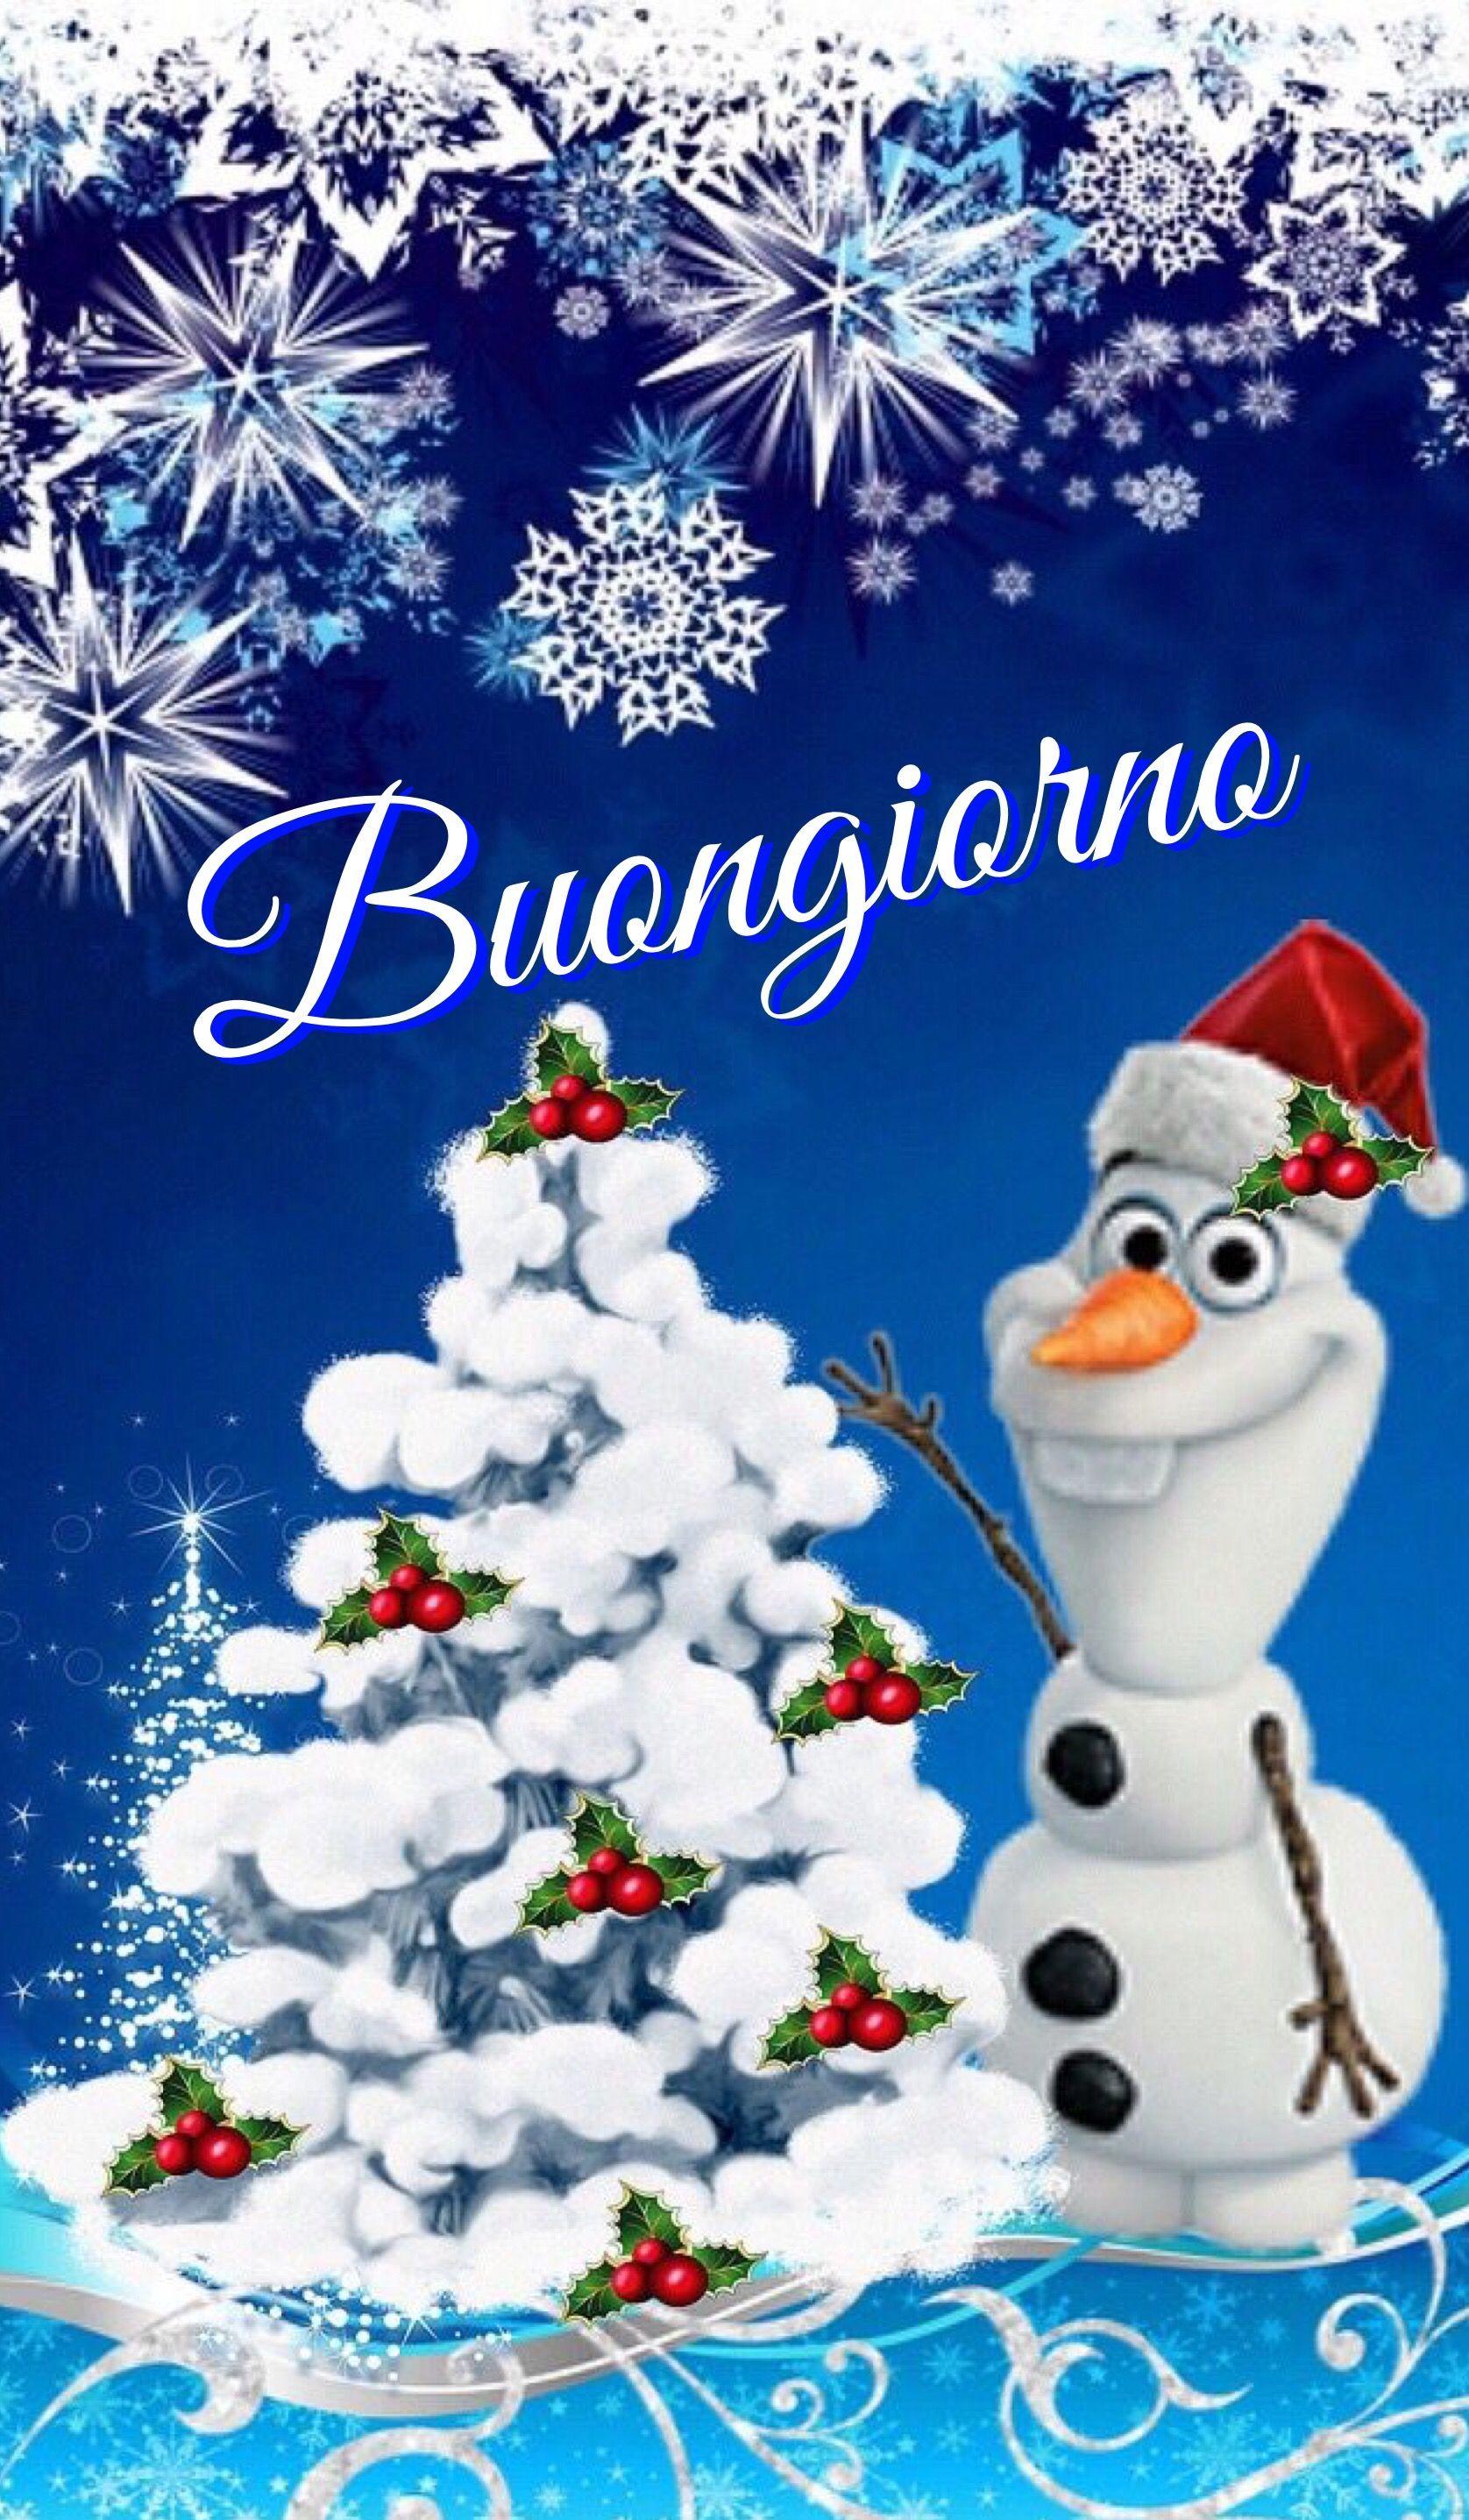 Buongiorno Frozen Christmas Art Disney Pictures Xmas